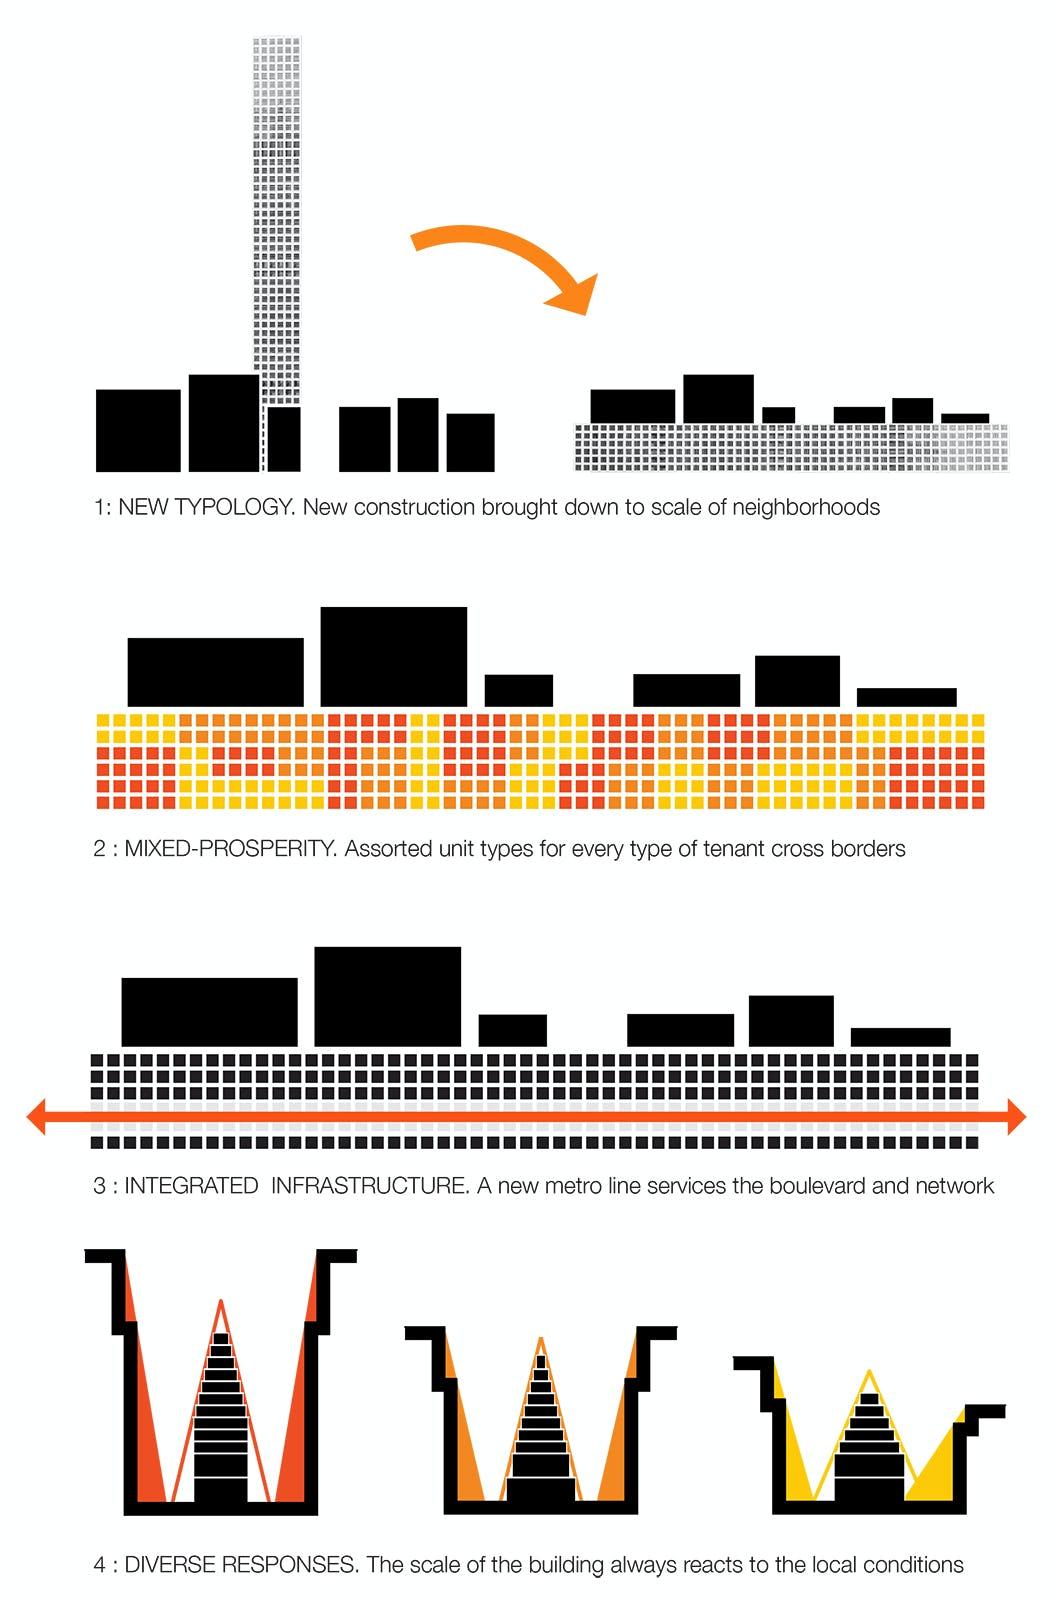 Fantasticoffense infrastructuralinfill concept diagram